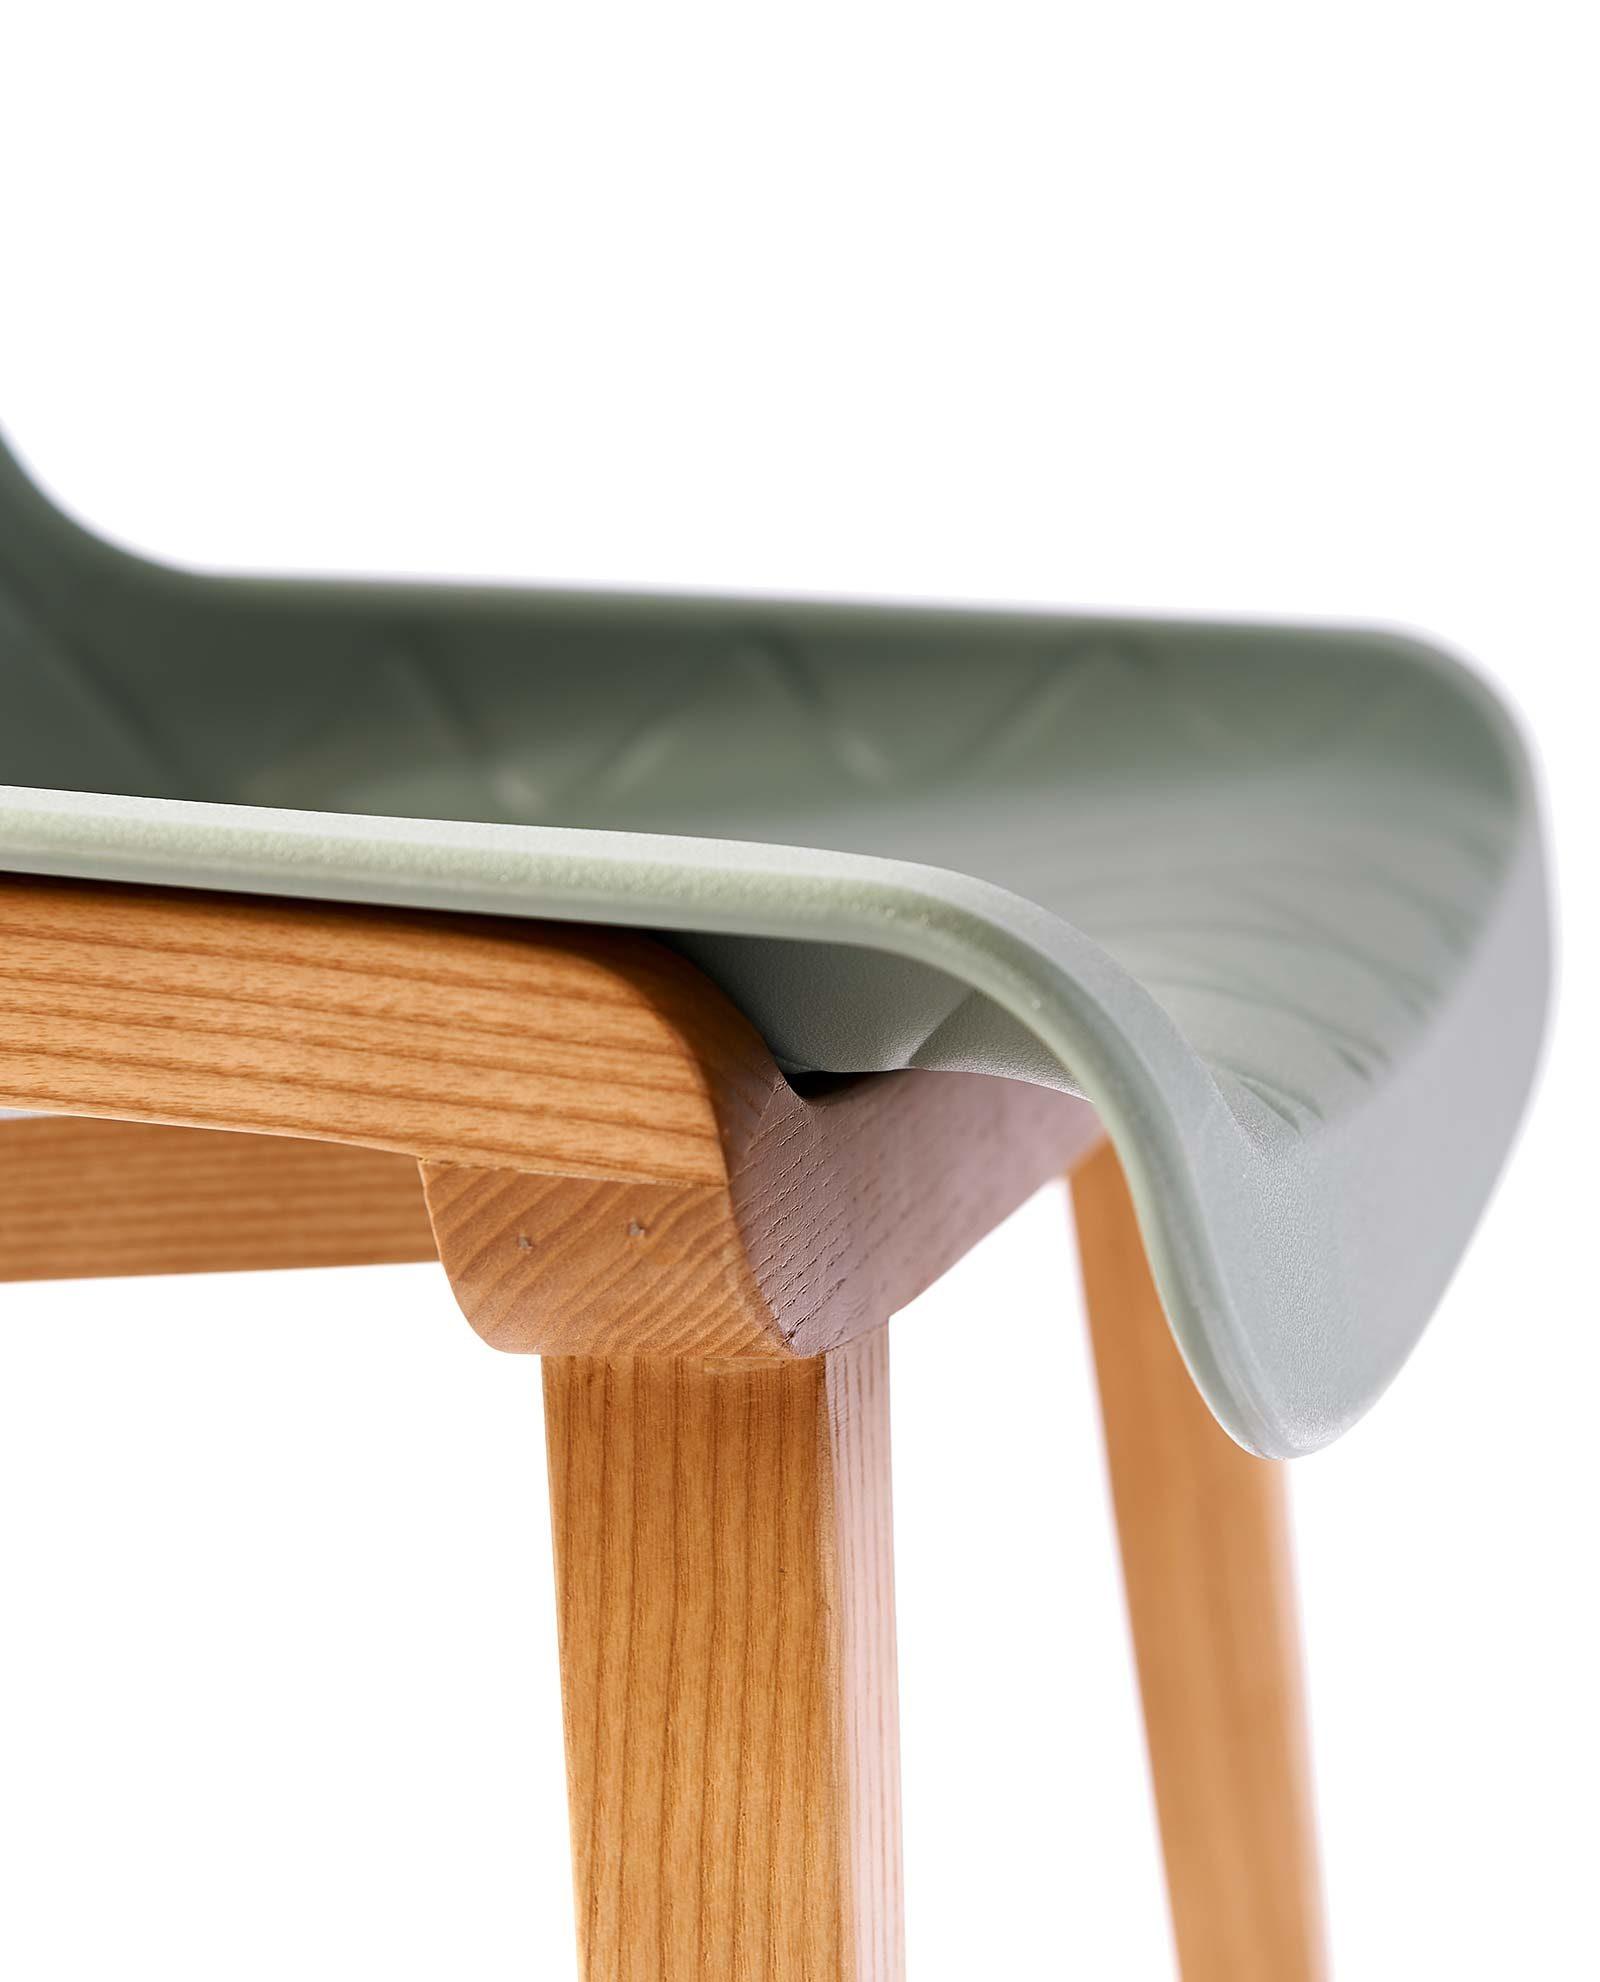 Riviera Maison dining chair Amsterdam City Green 4321003 5